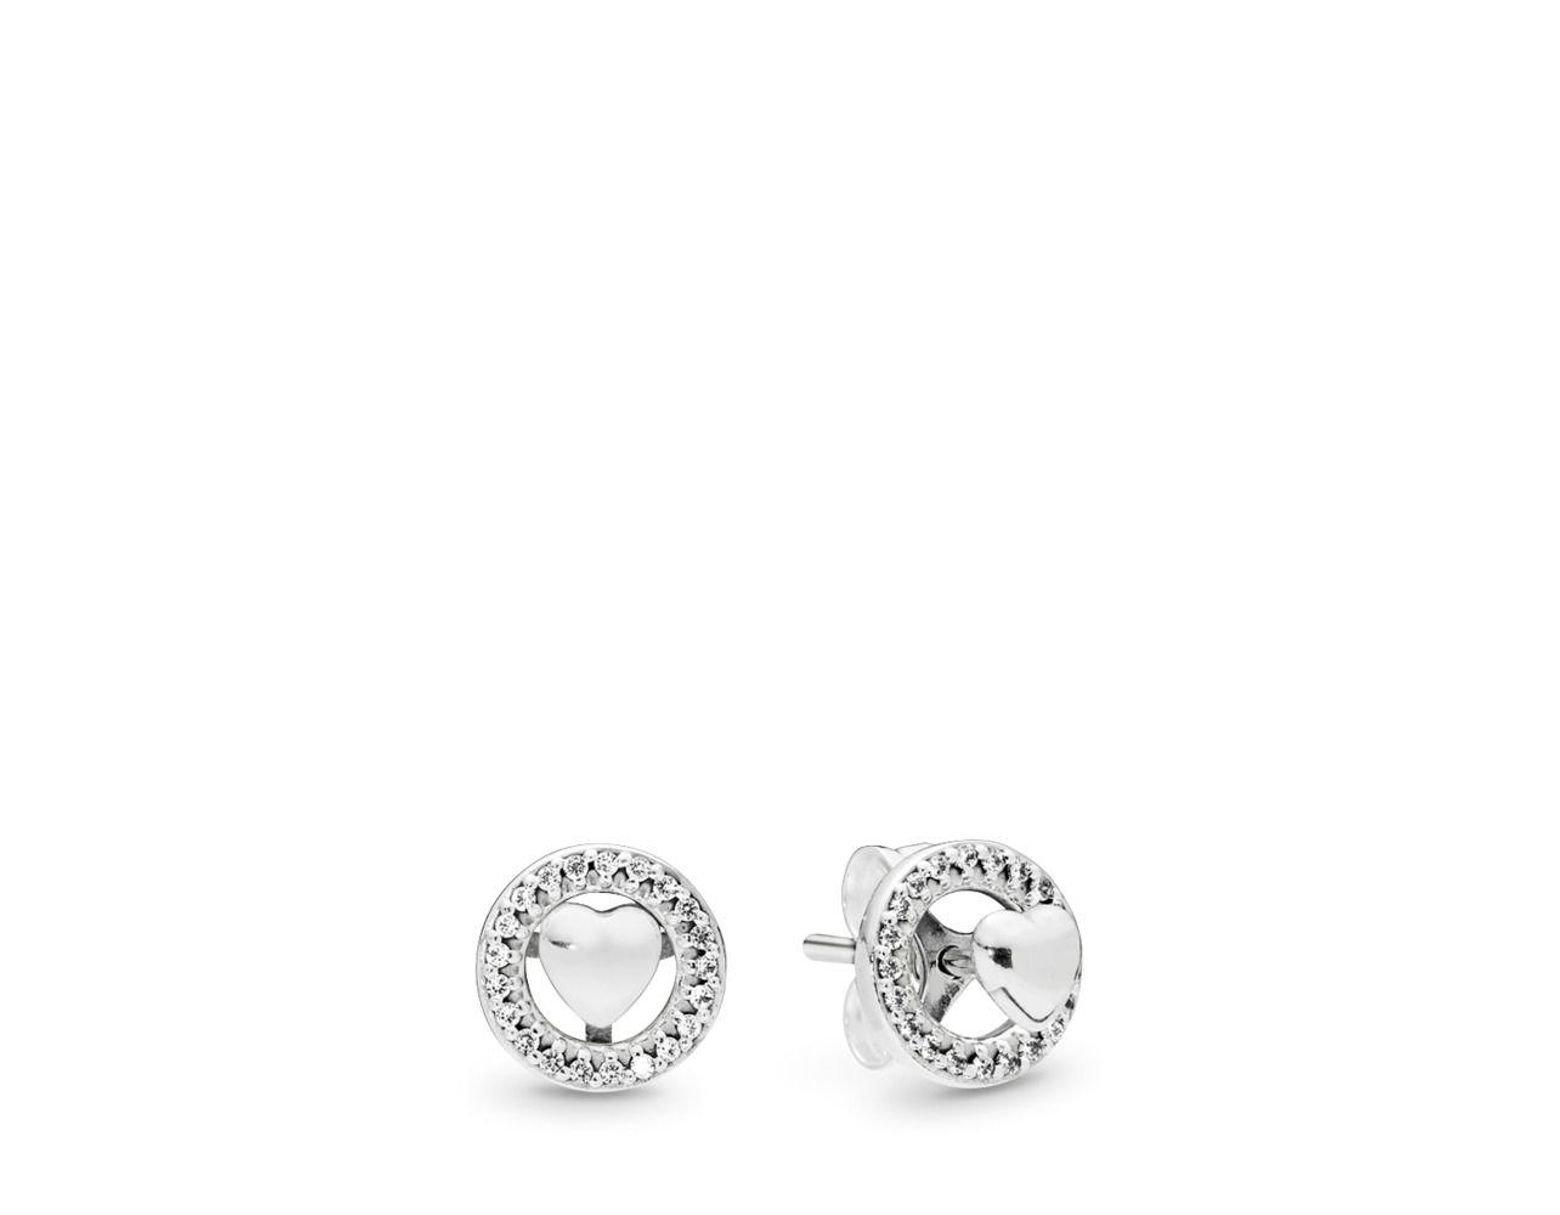 e2f191192 PANDORA Forever Hearts Stud Earrings - Lyst